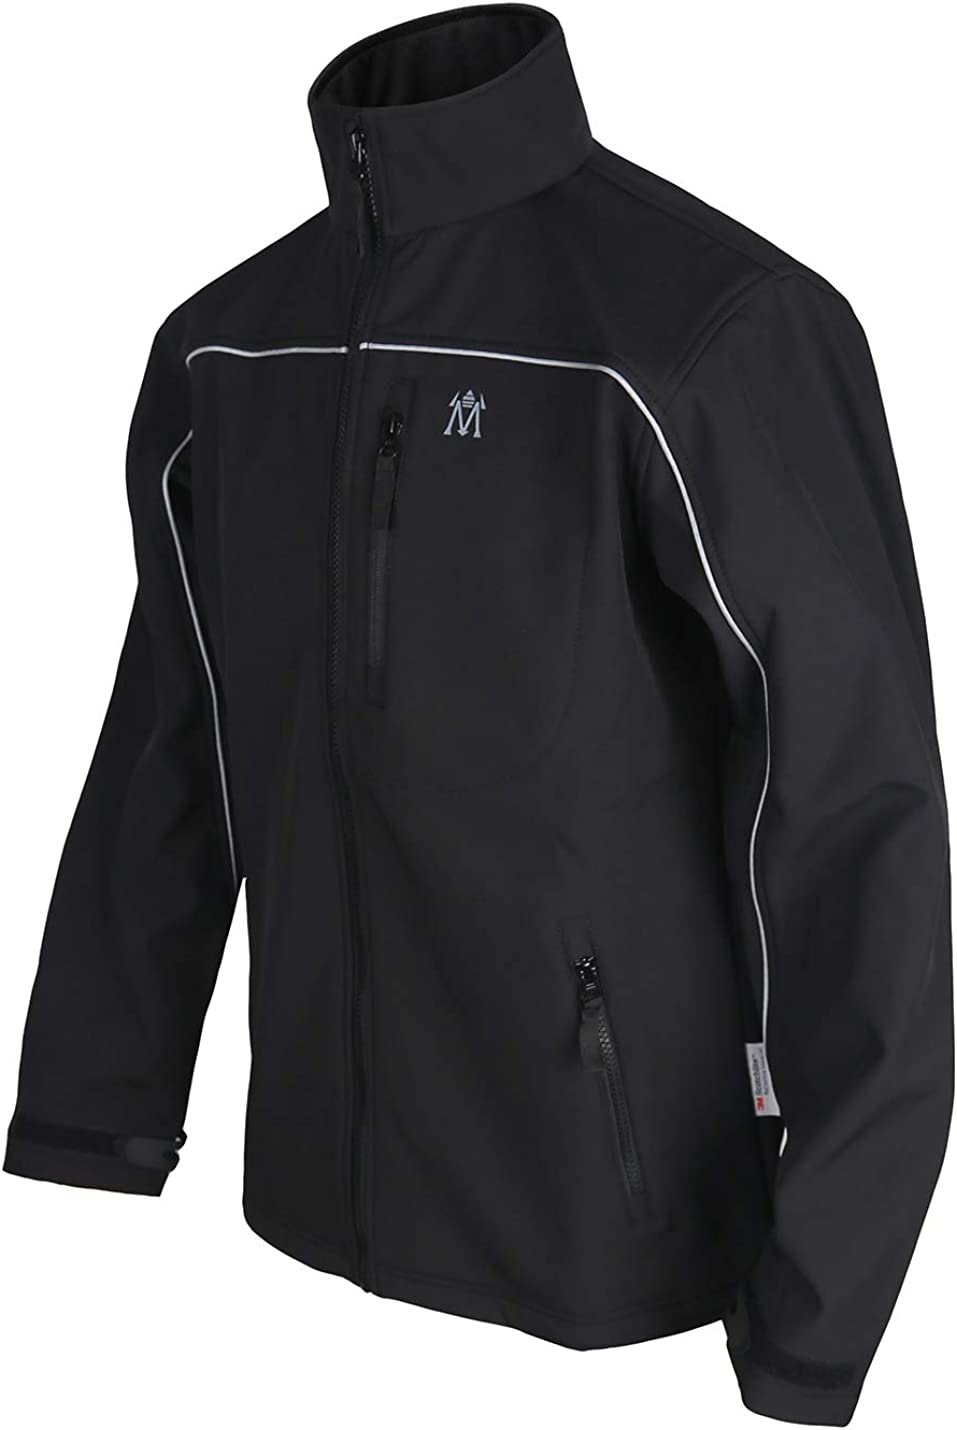 Men's Climbing Jacket Warm Fleece Windproof Outdoors Tactical Softshell